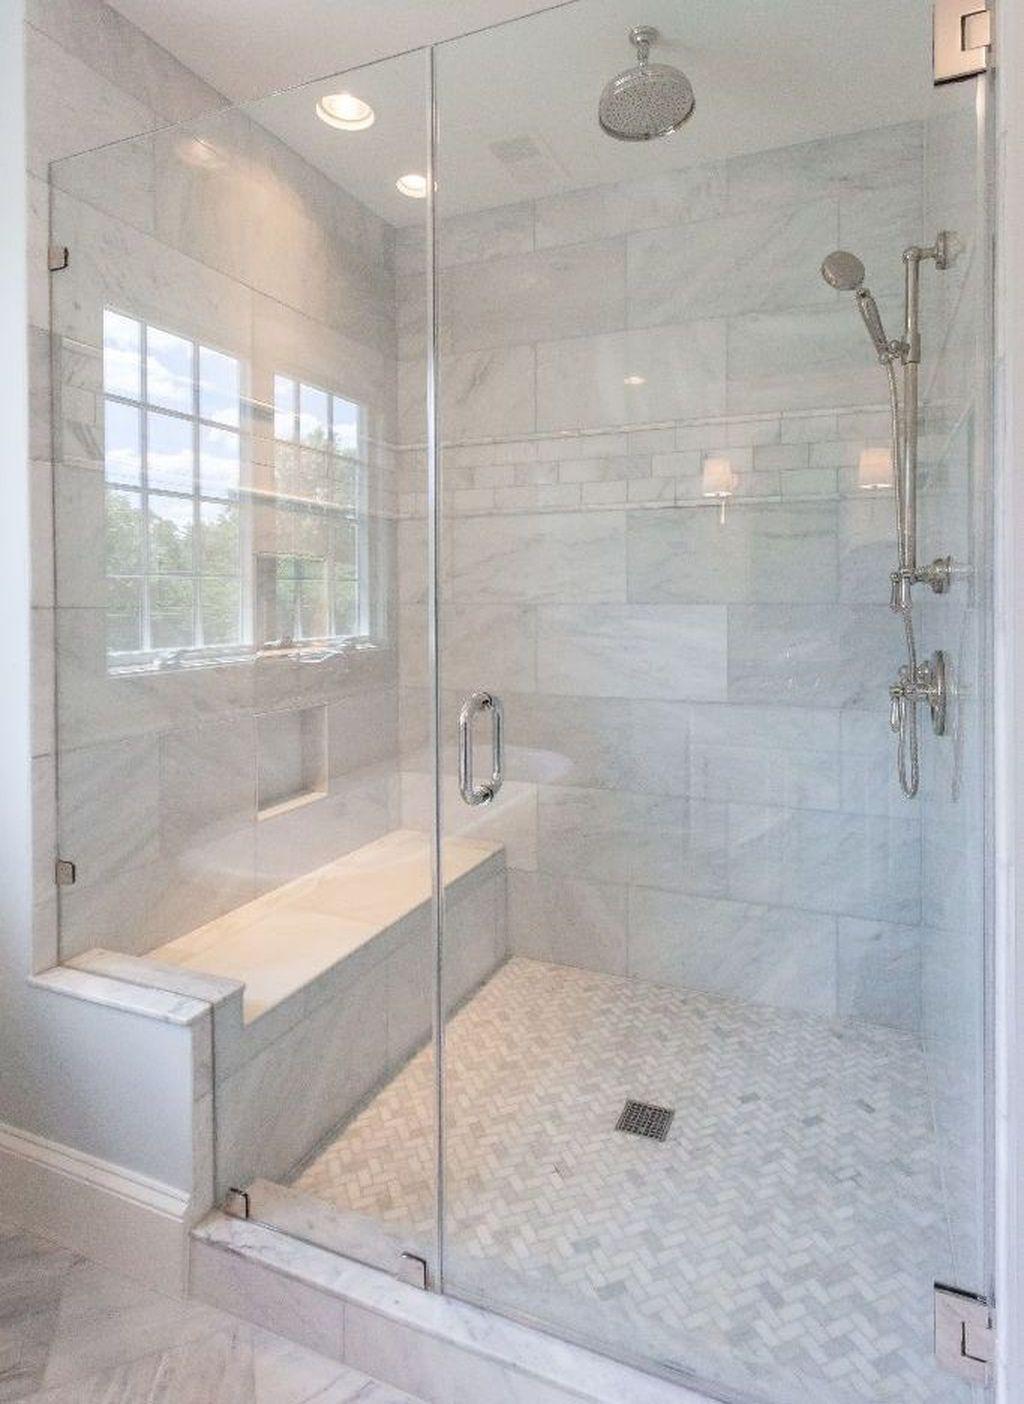 Beautiful Master Bathroom Remodel Design Ideas 35 Bathroom Model Shower Remodel Bathrooms Remodel